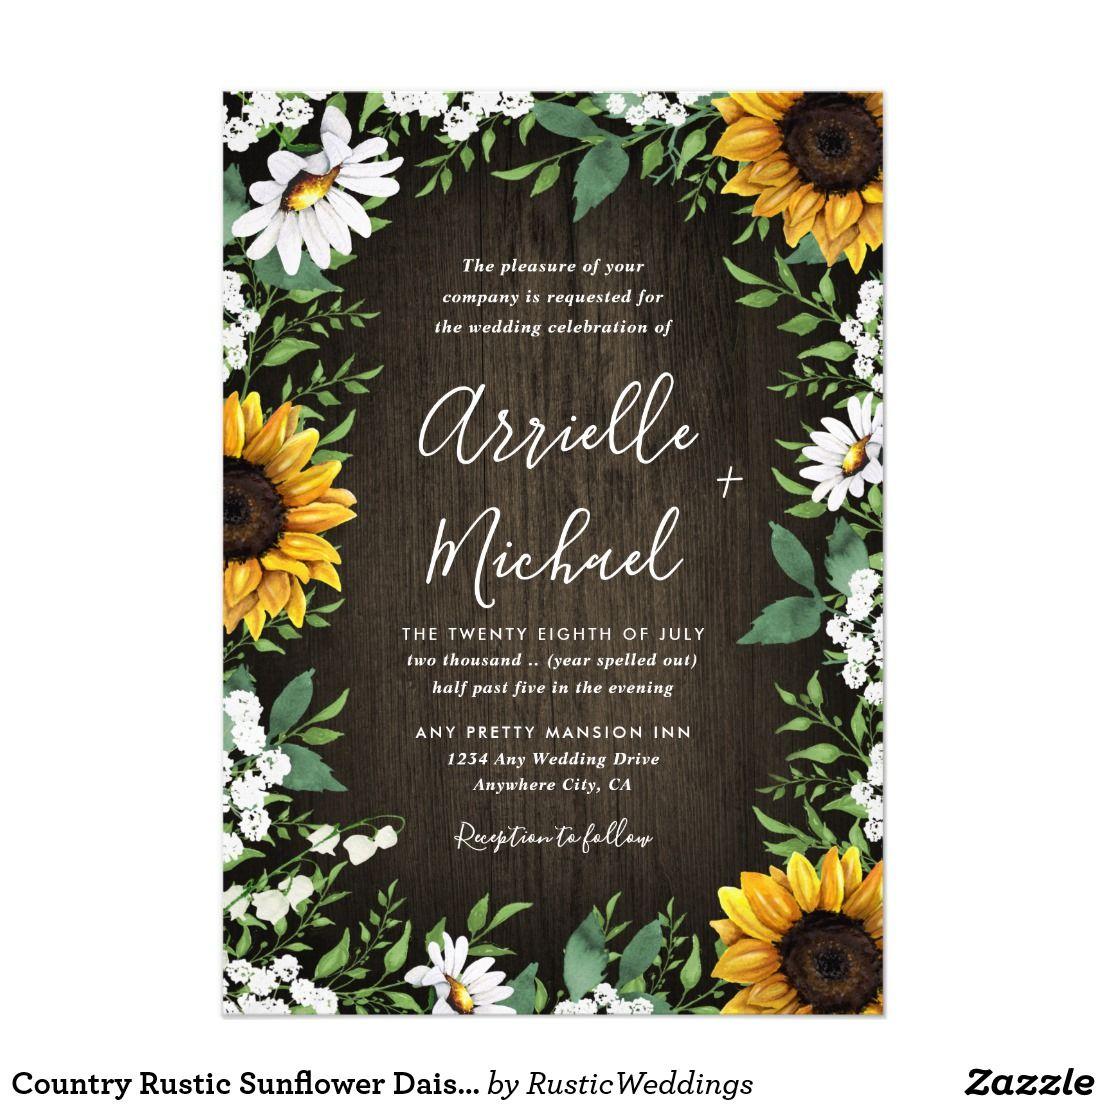 Country Rustic Sunflower Daisy Wedding Invitations Zazzle Com Daisy Wedding Invitations Sunflower Wedding Rustic Sunflower Wedding